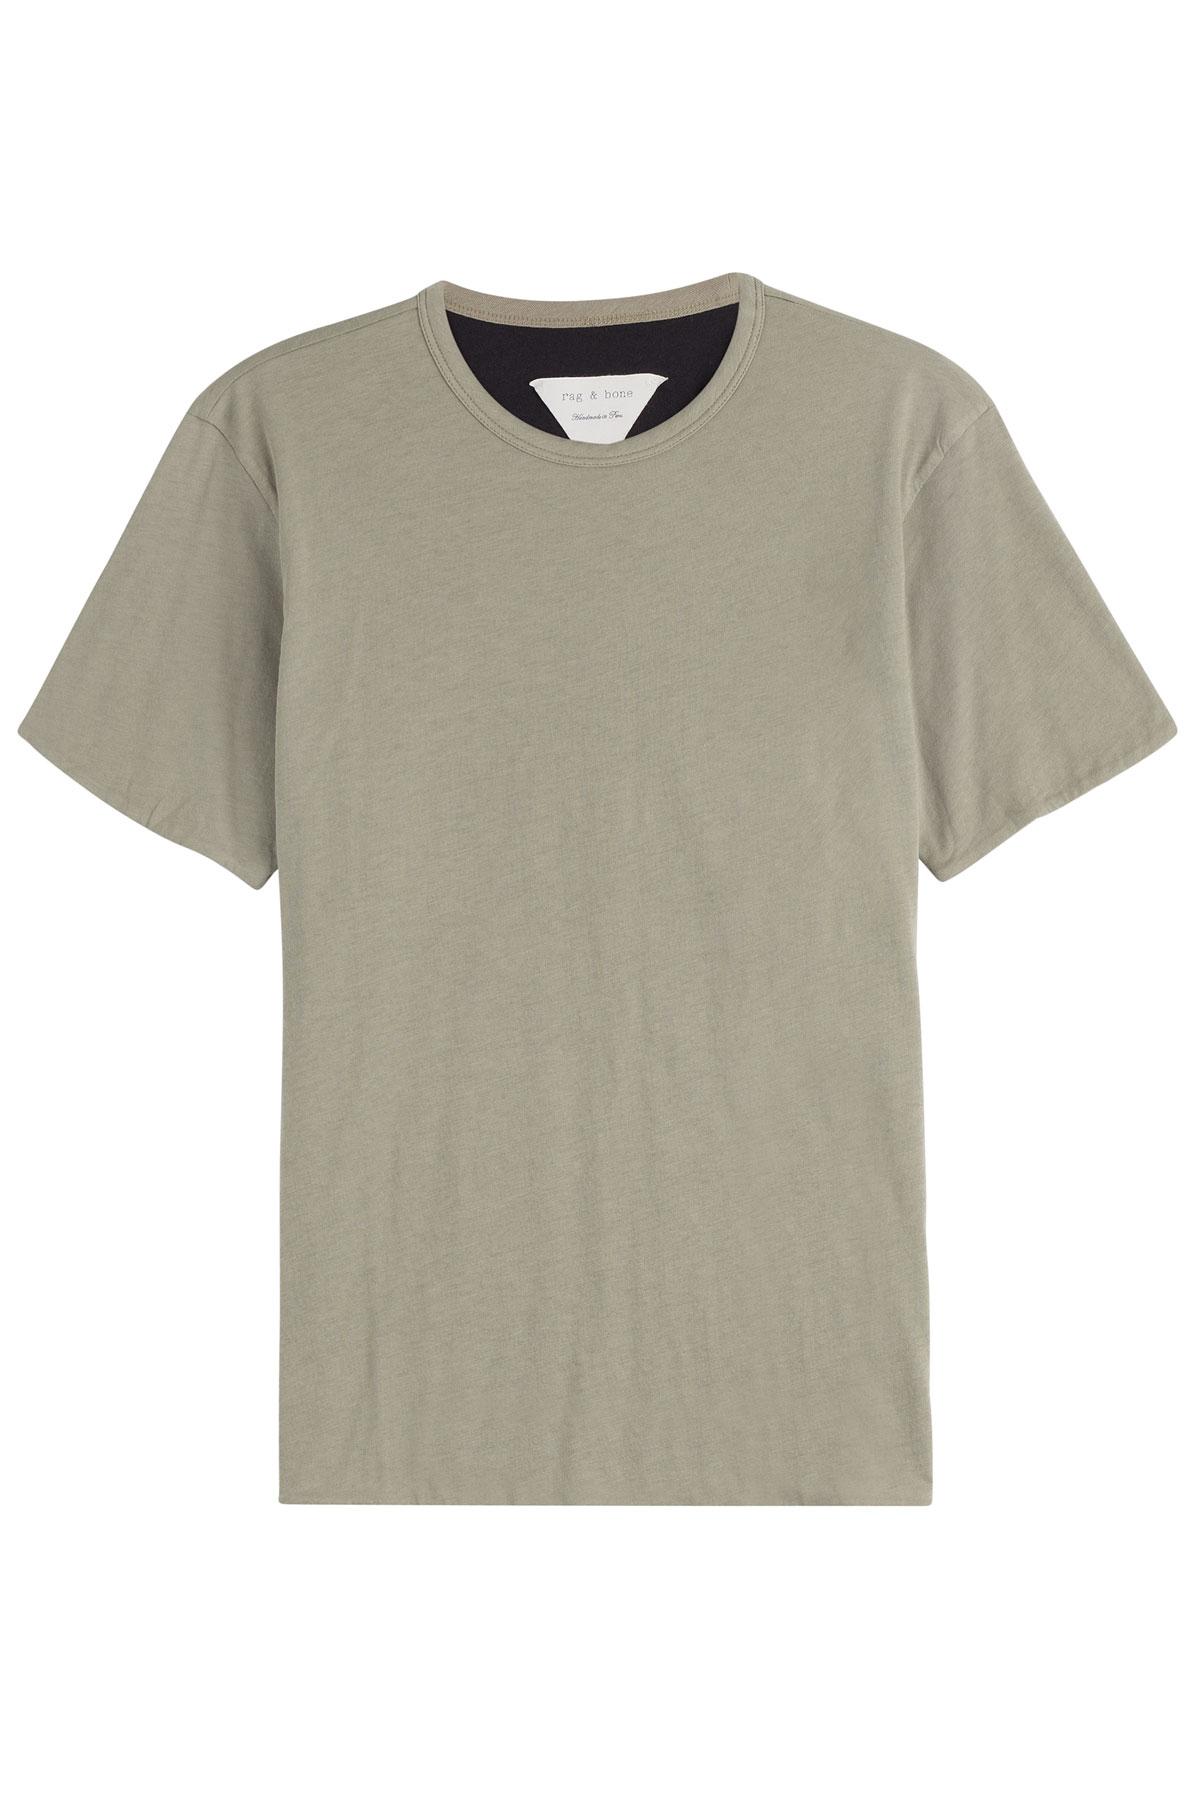 Rag Bone Reversible Cotton T Shirt Green In White For